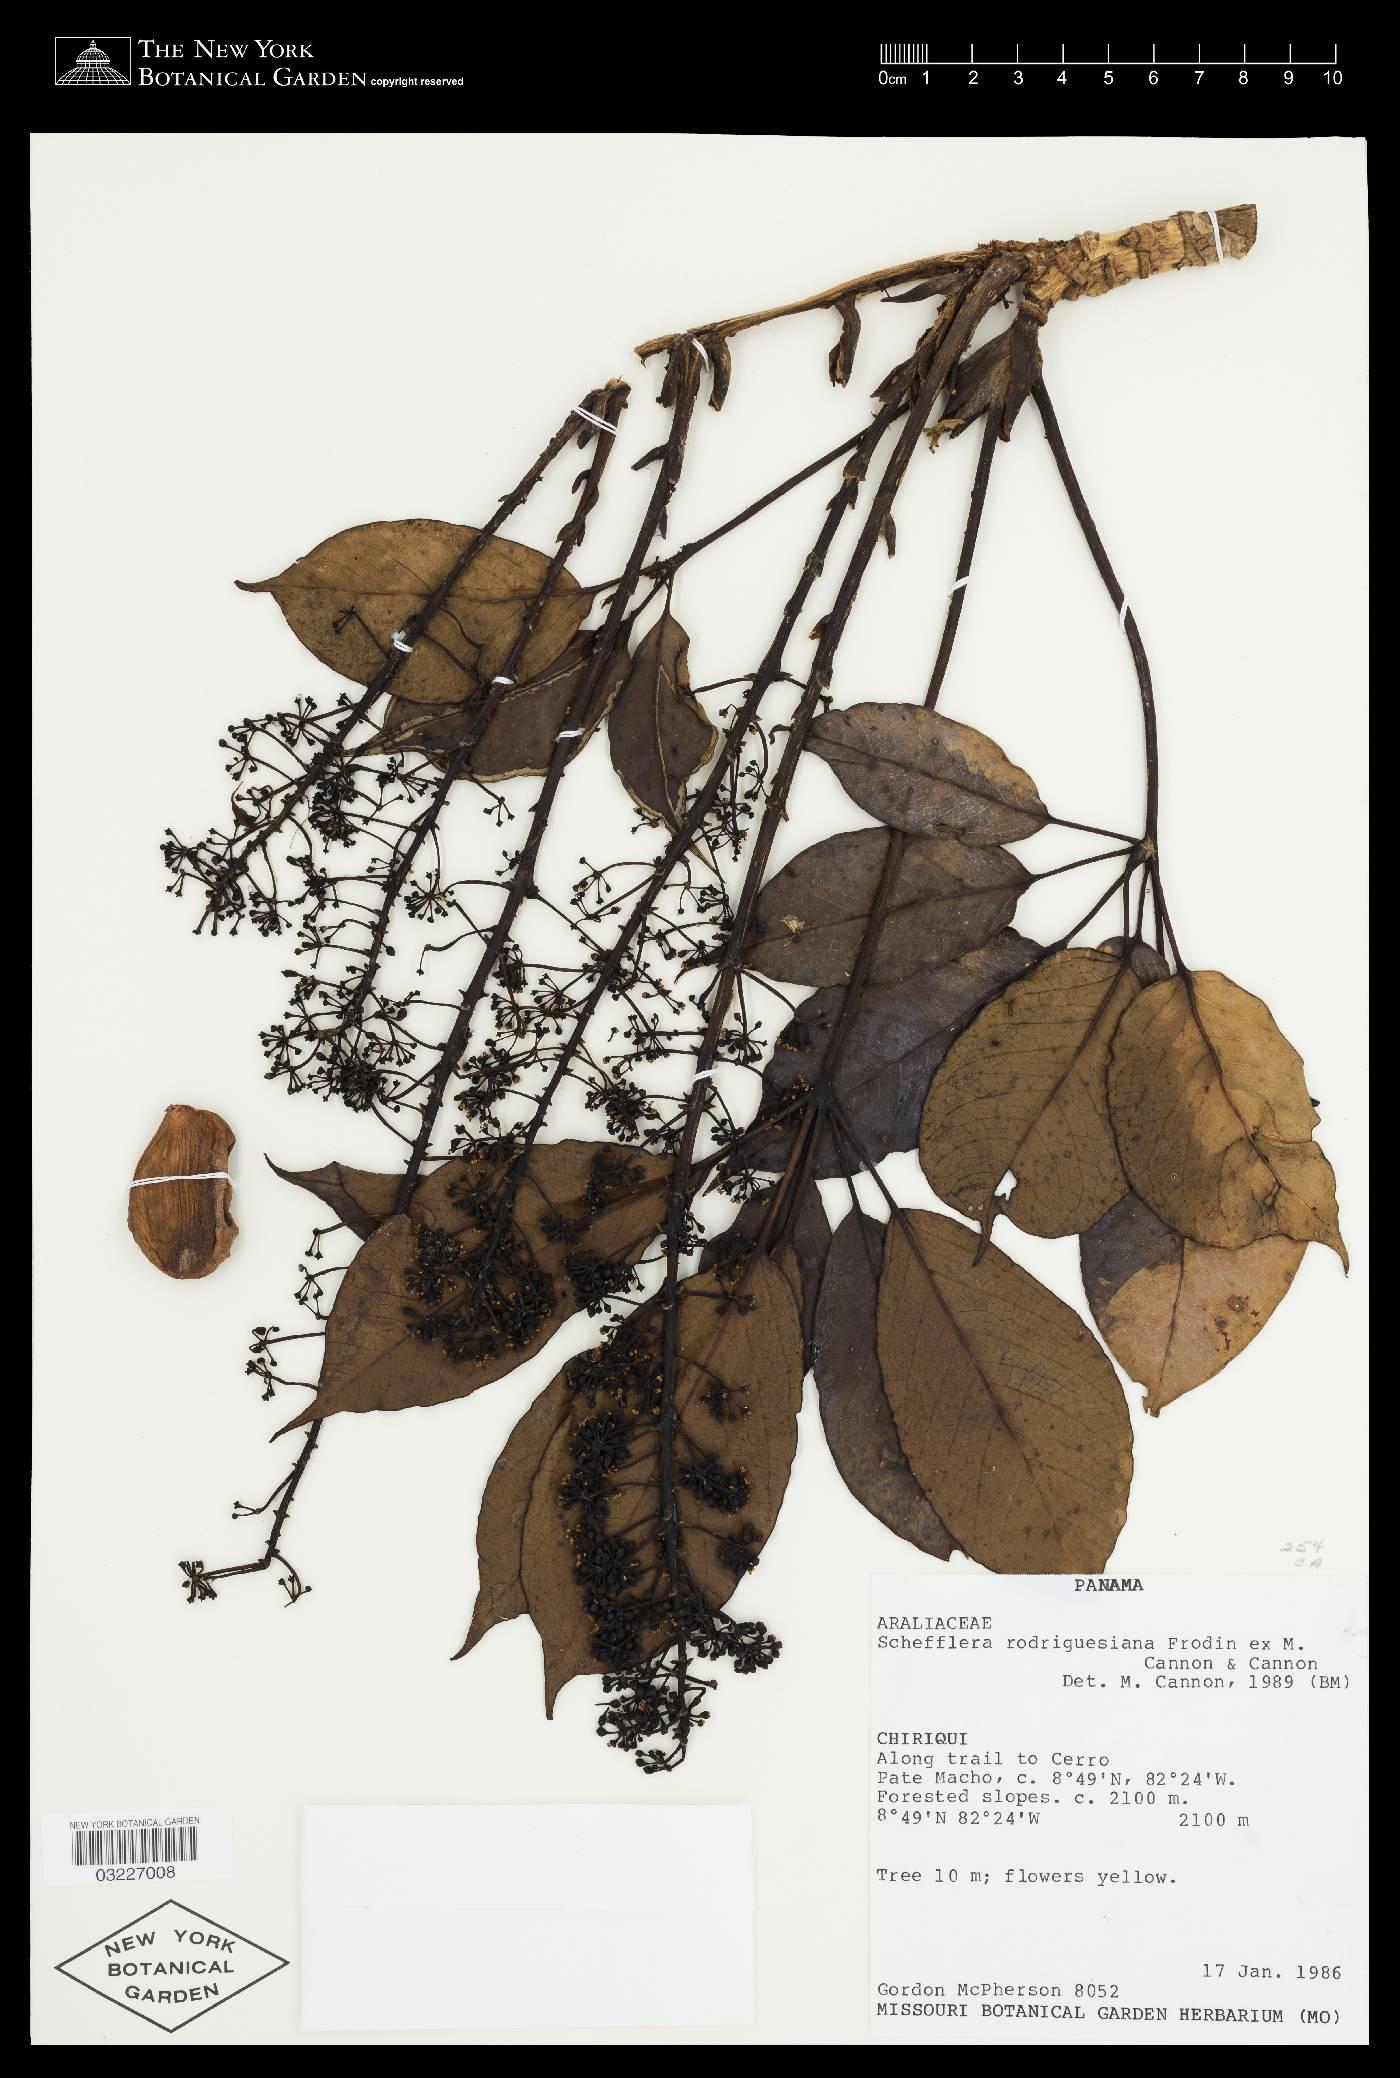 Schefflera rodriguesiana image